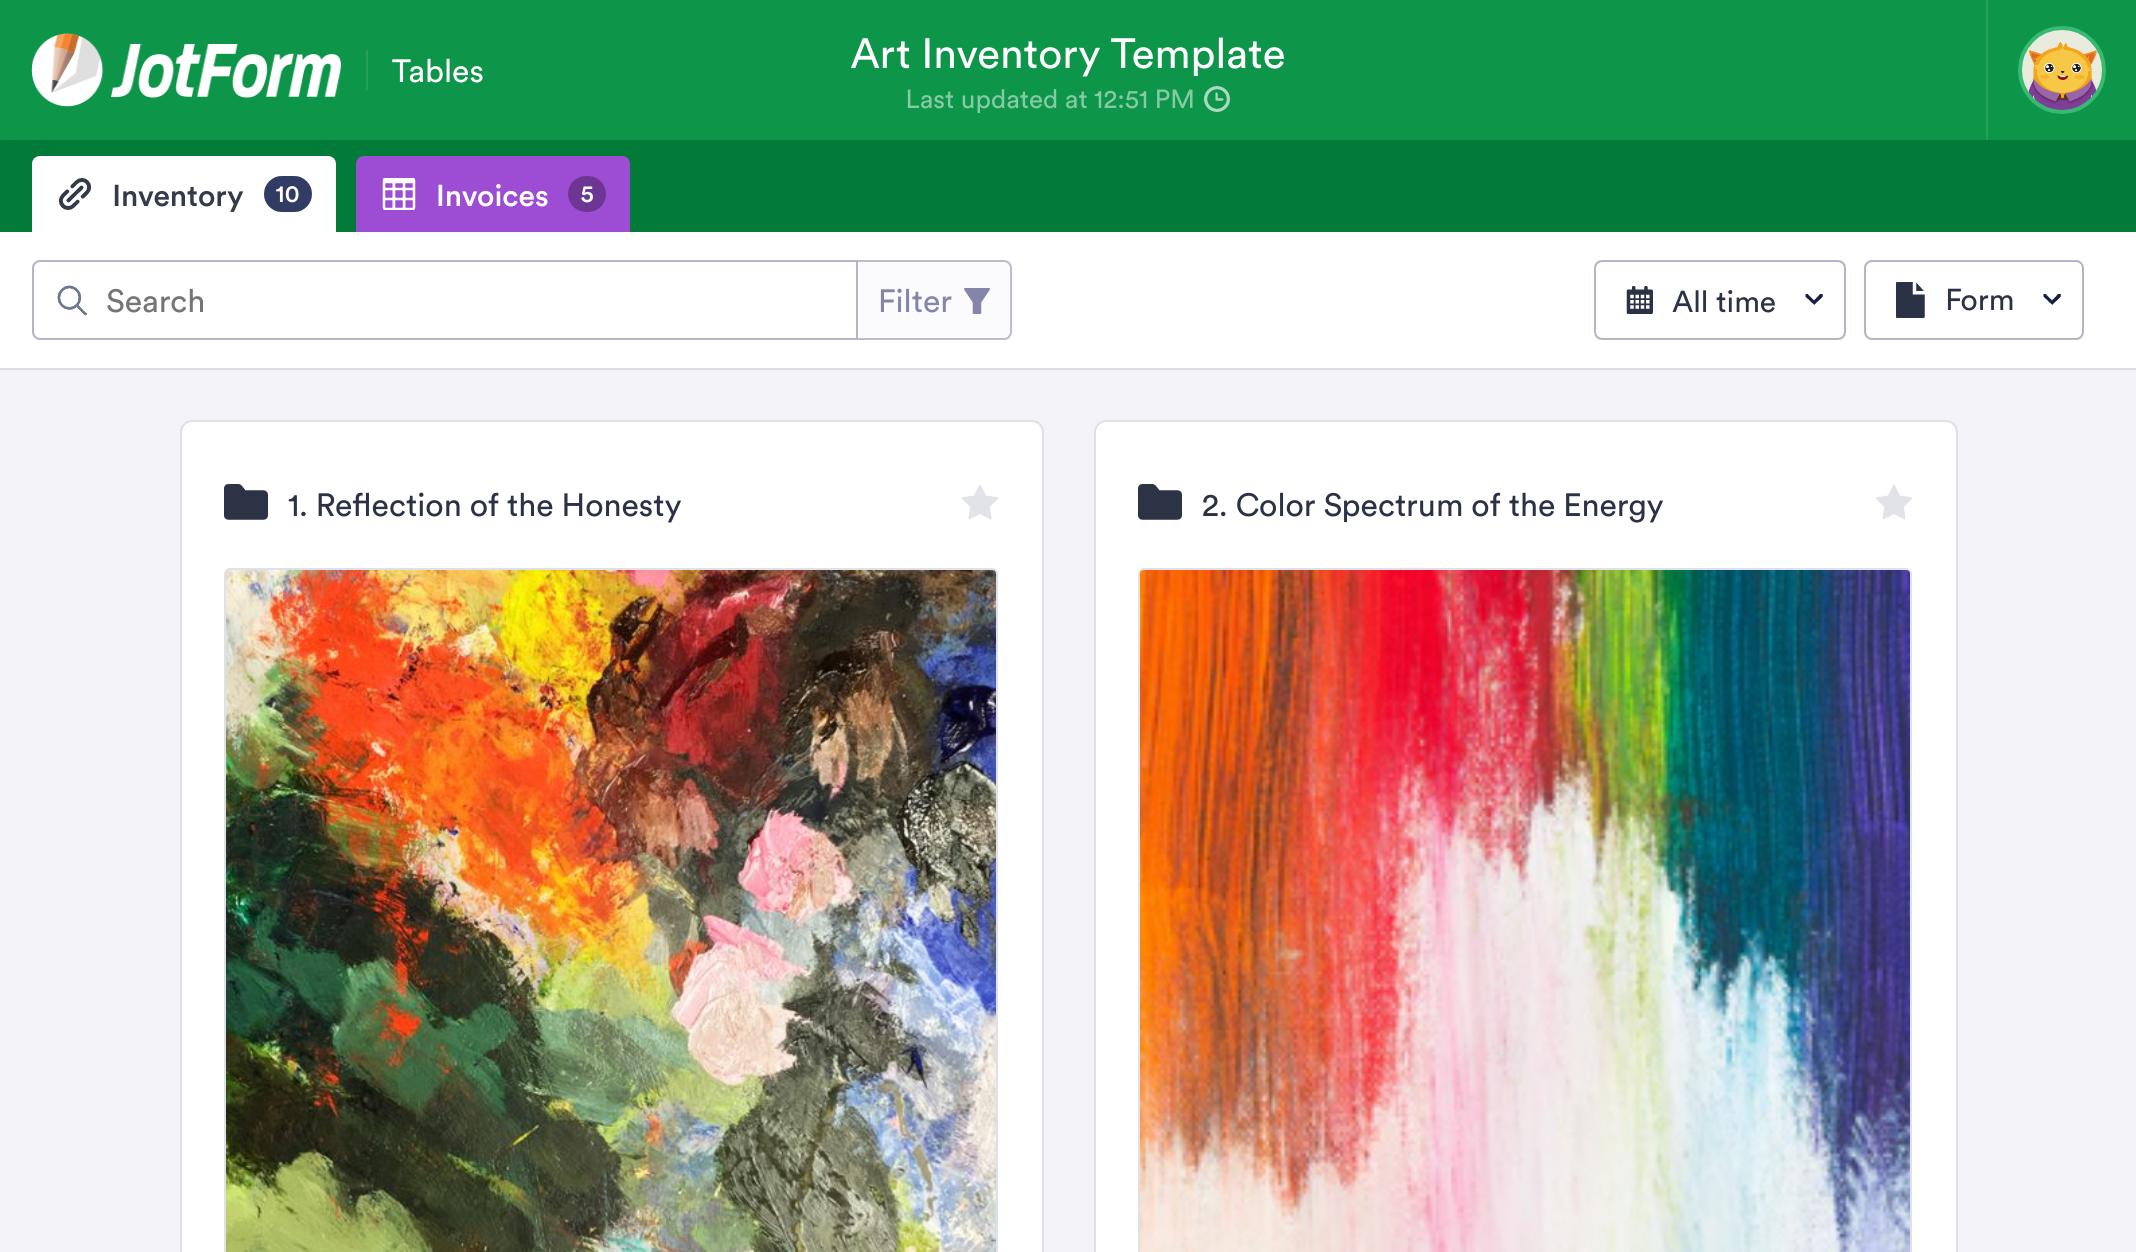 Art Inventory Template